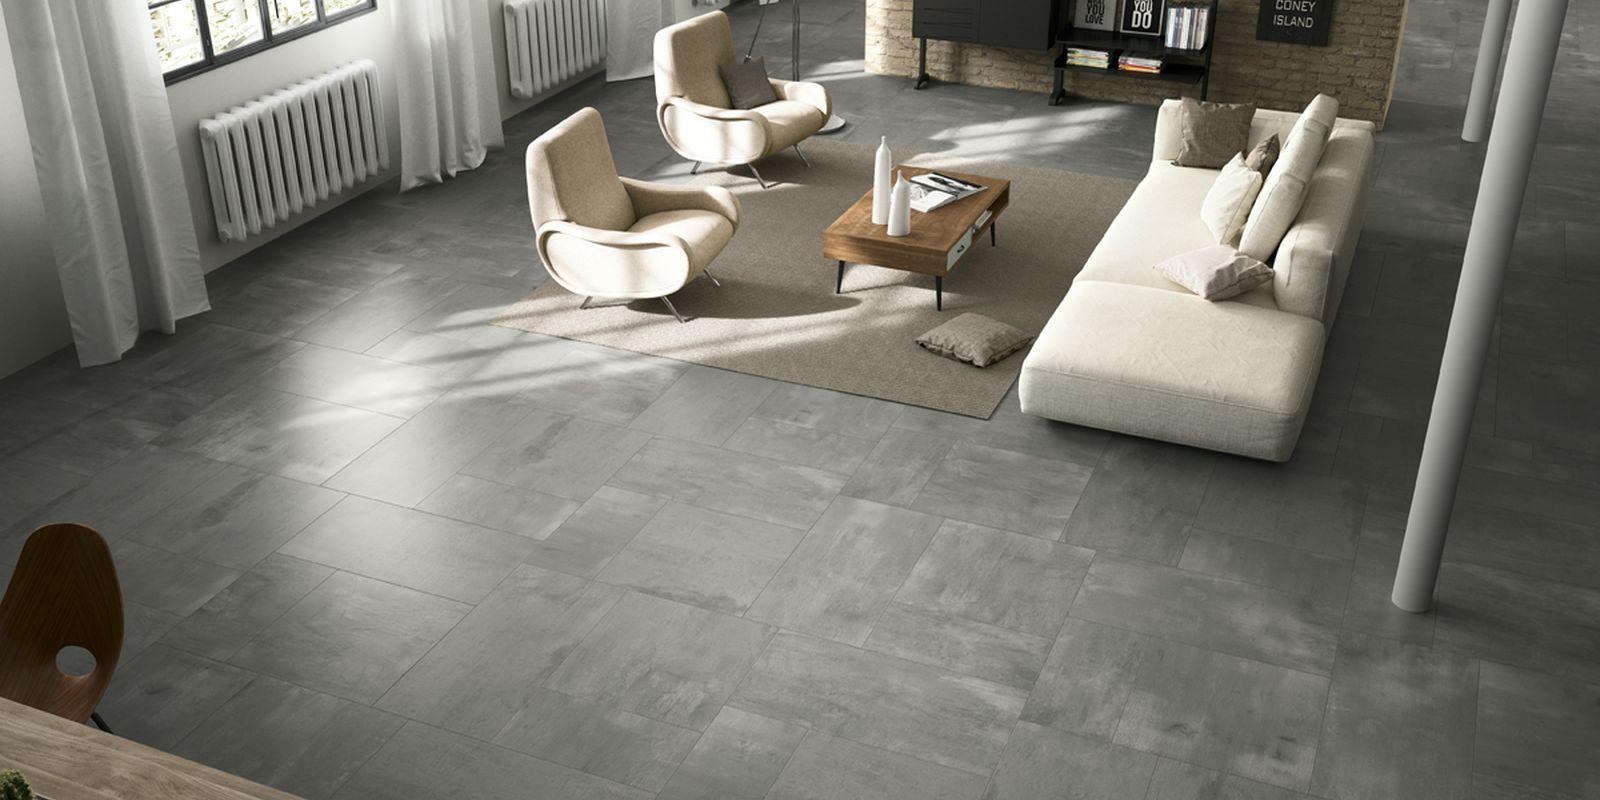 Creative concrete tiles living modern ceramic full body porcelain creative concrete tiles living modern ceramic full body porcelain tile am creacon 1a dailygadgetfo Choice Image